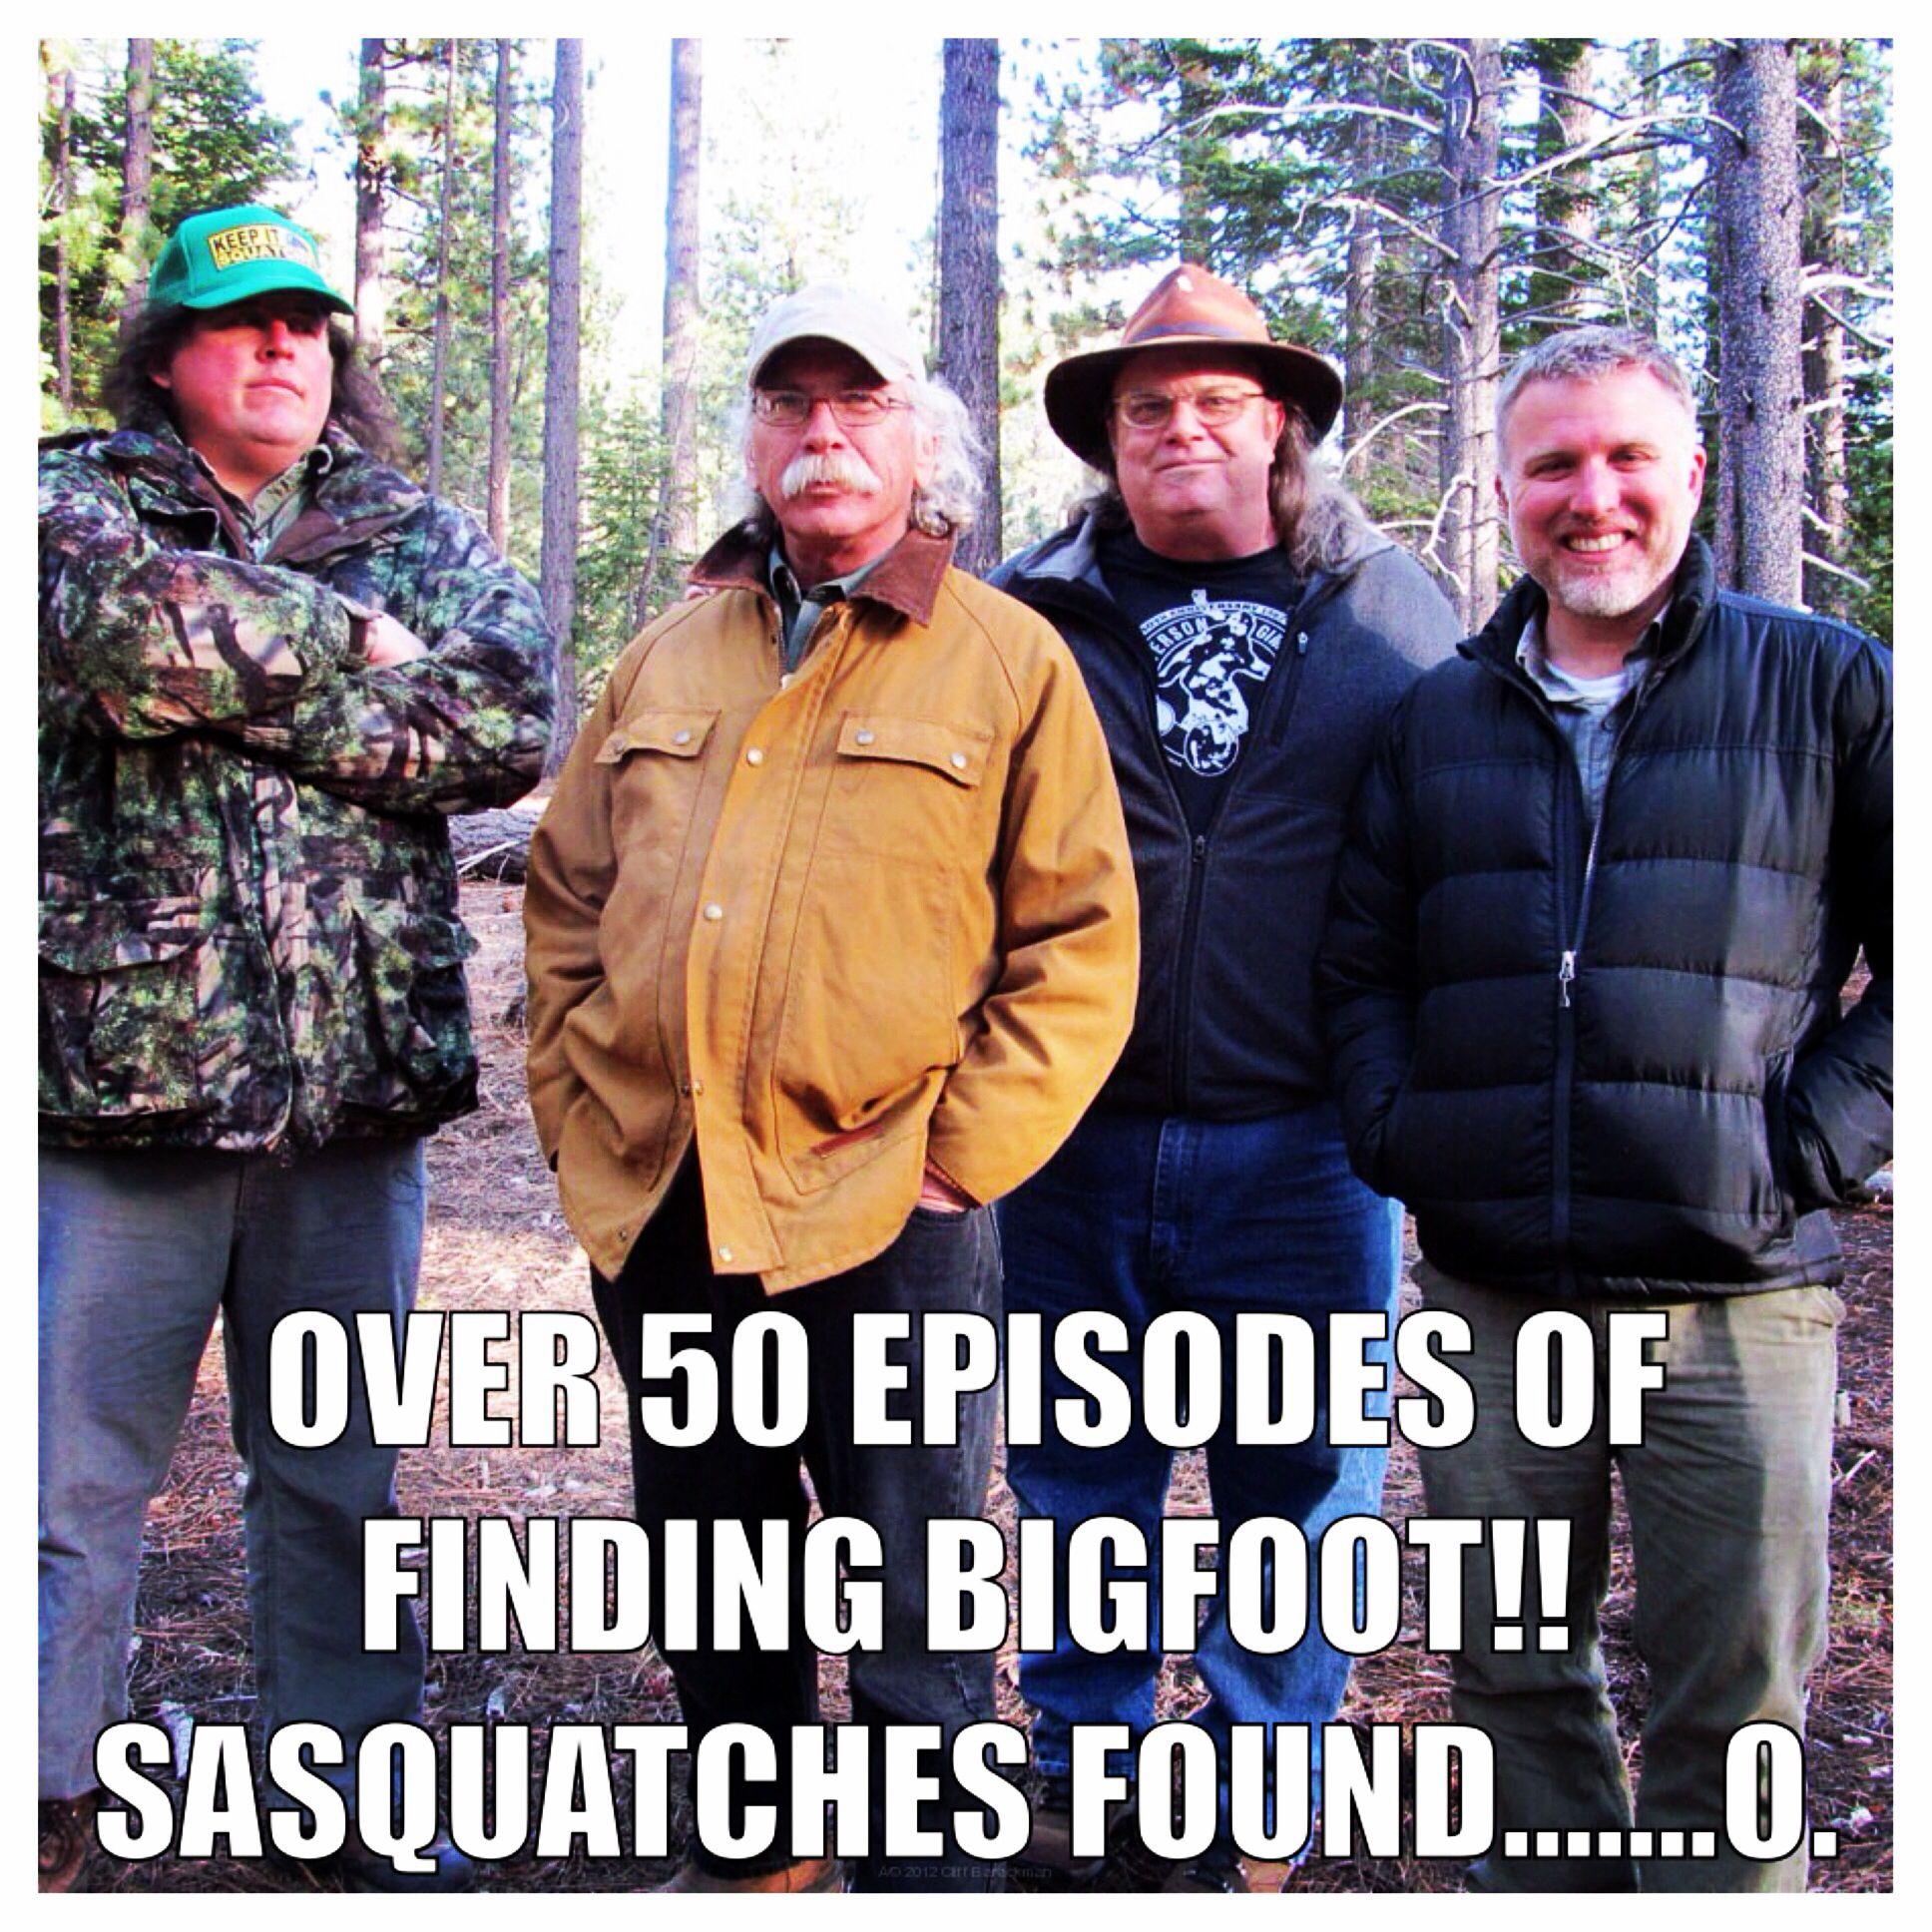 funny bigfoot memes - digitalspace info